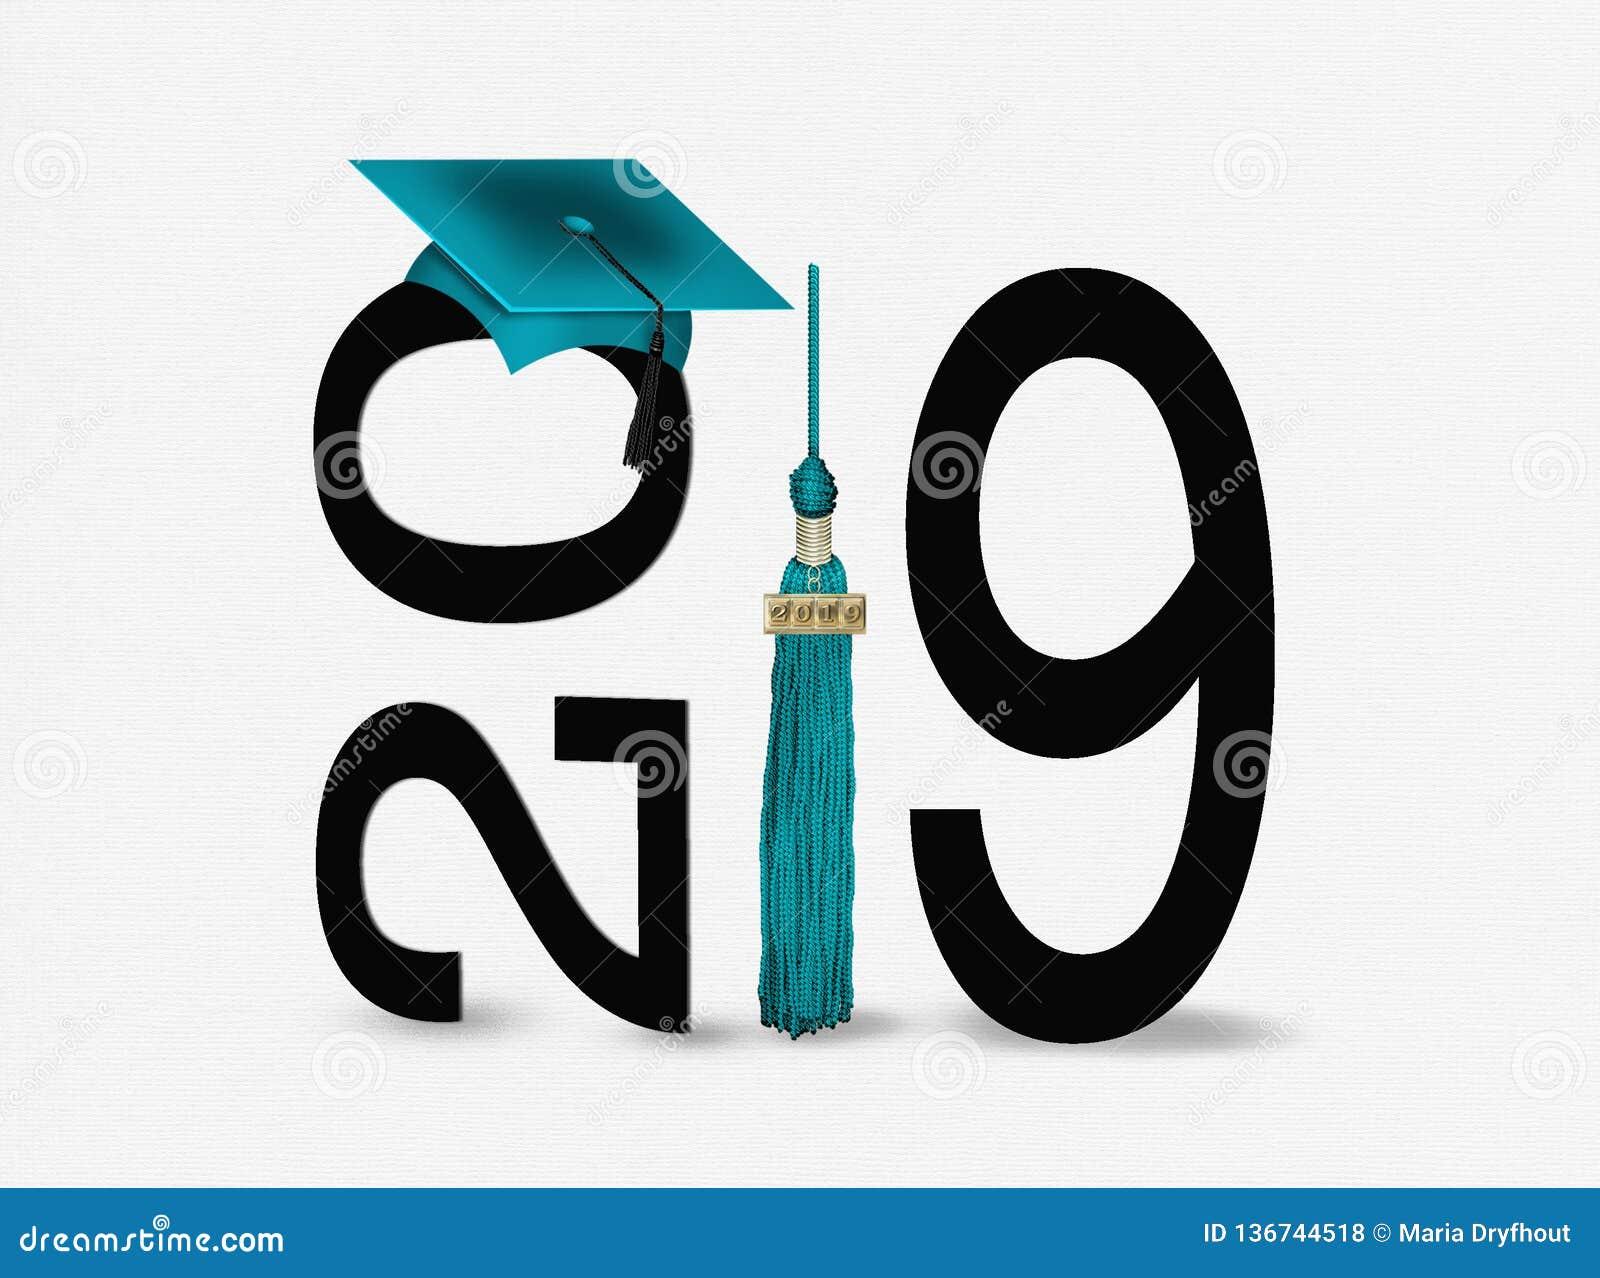 Graduation cap and tassel 2019 teal and black